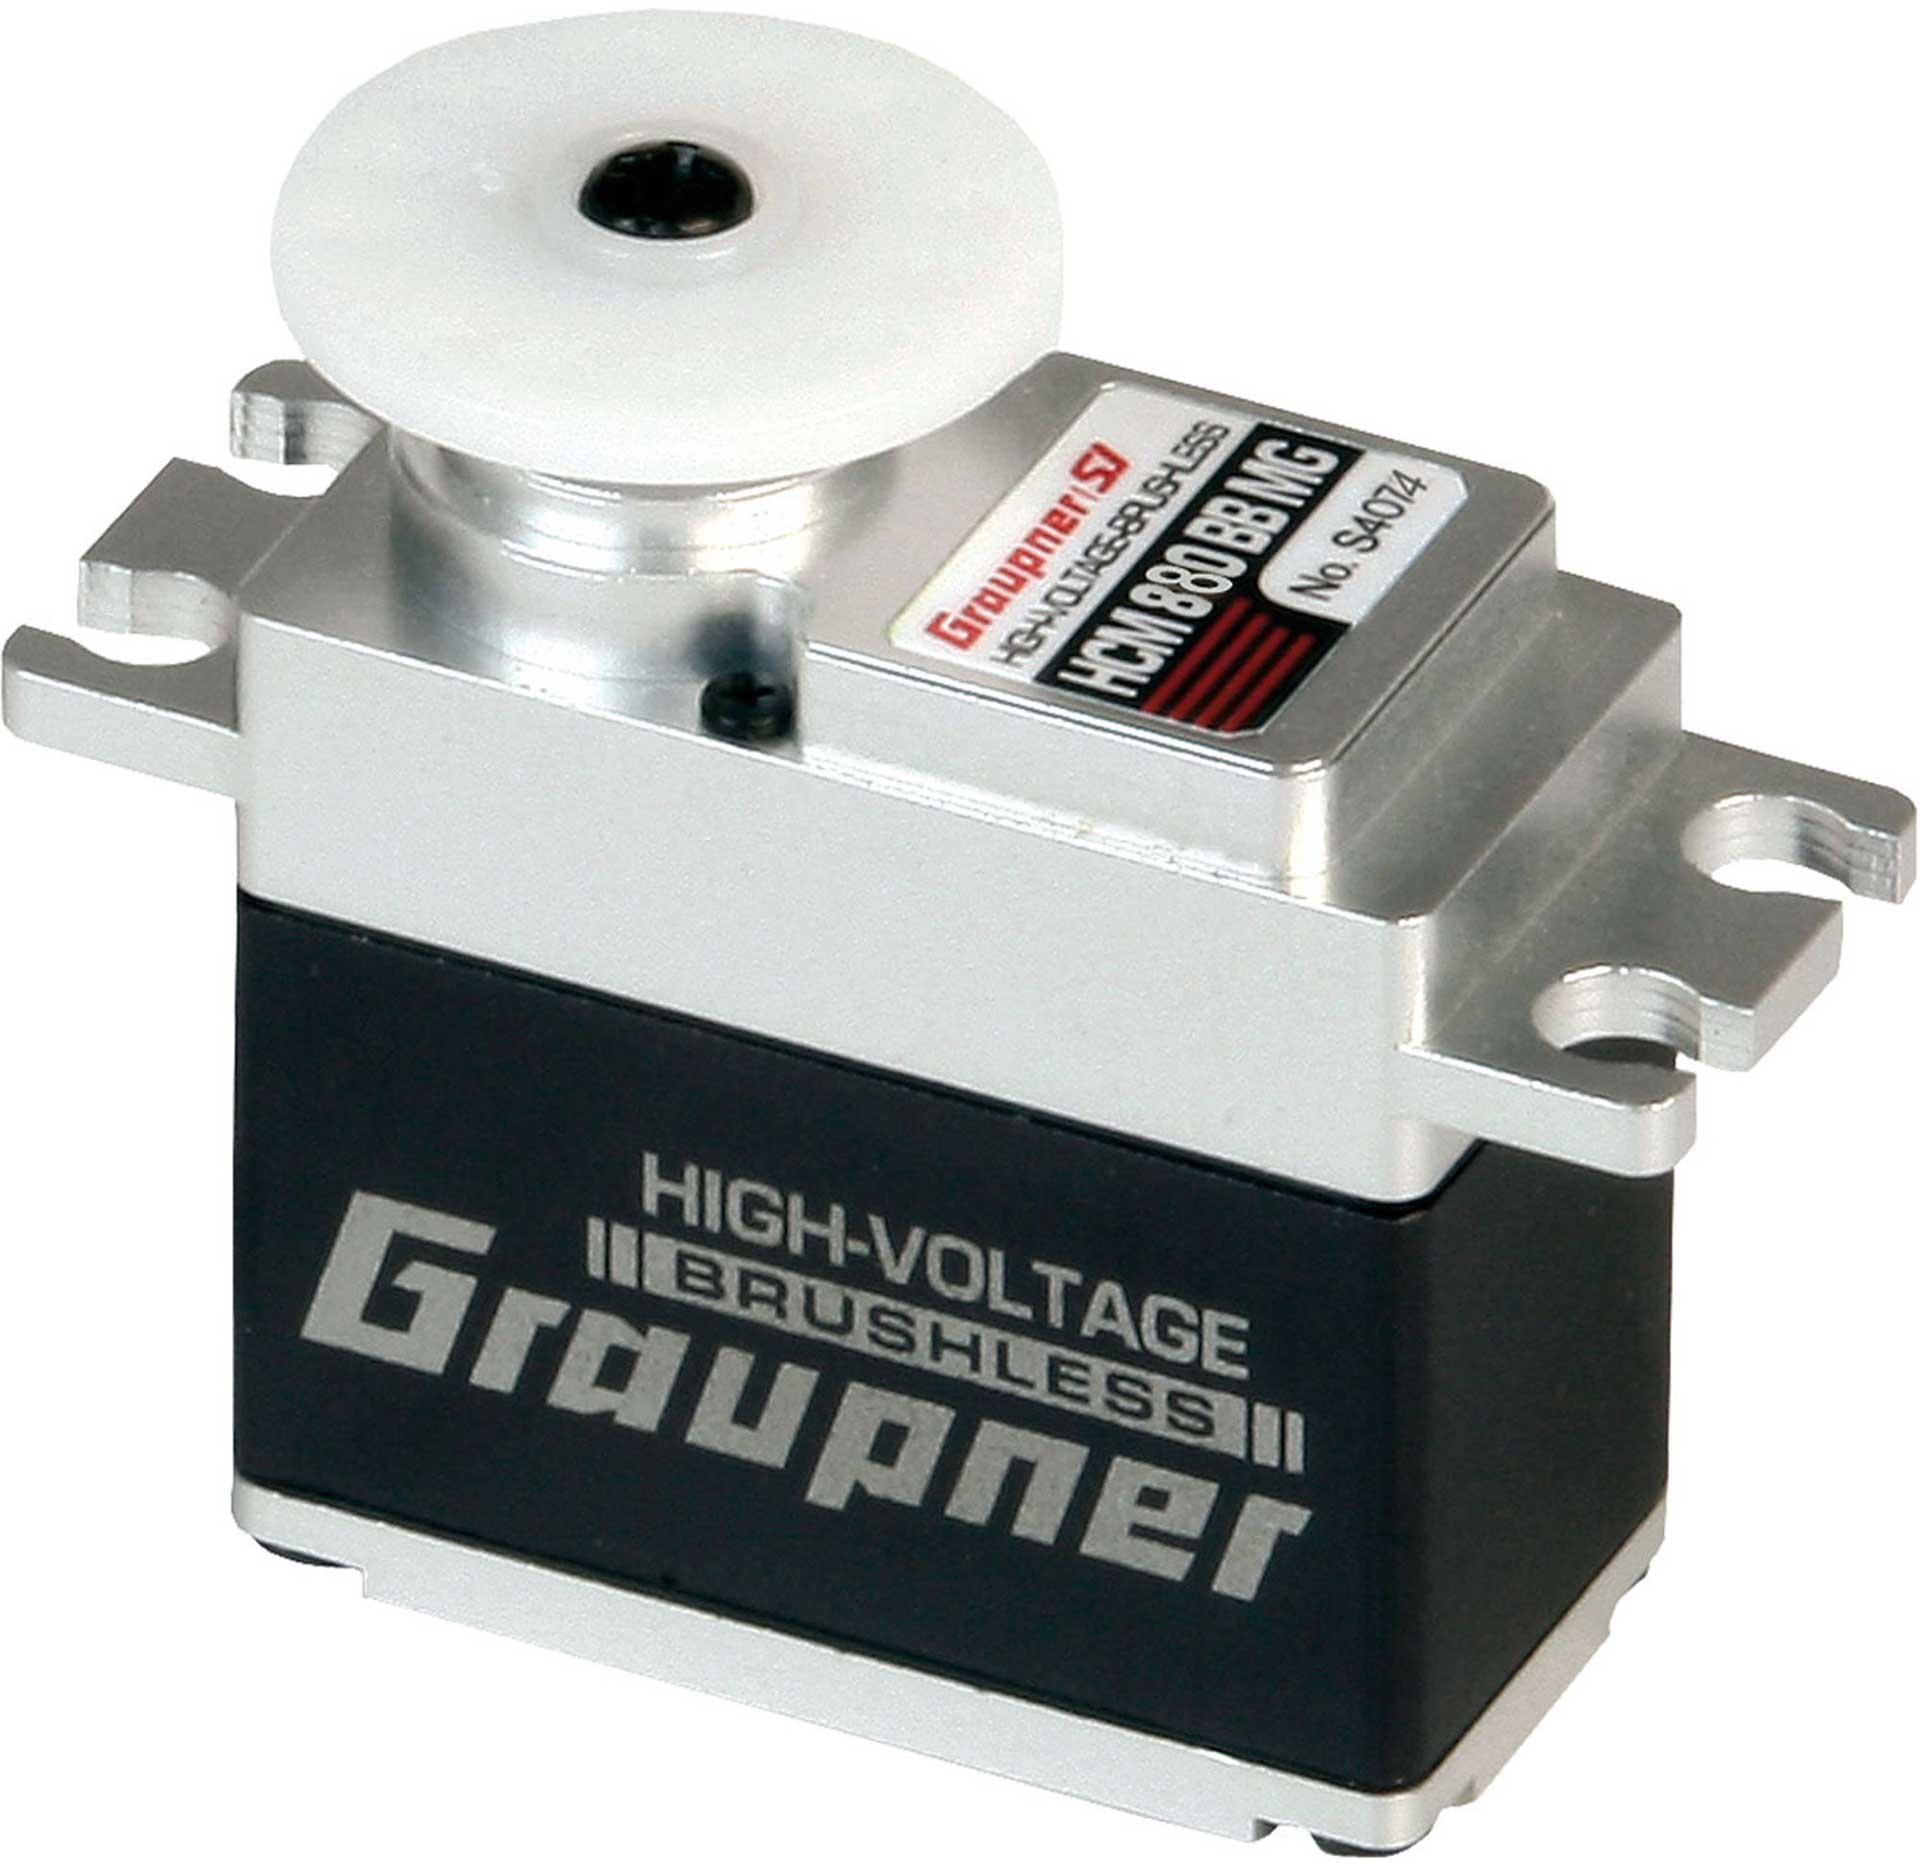 GRAUPNER HCM 880 BB MG High-Speed 20mm HV CL Digital Servo